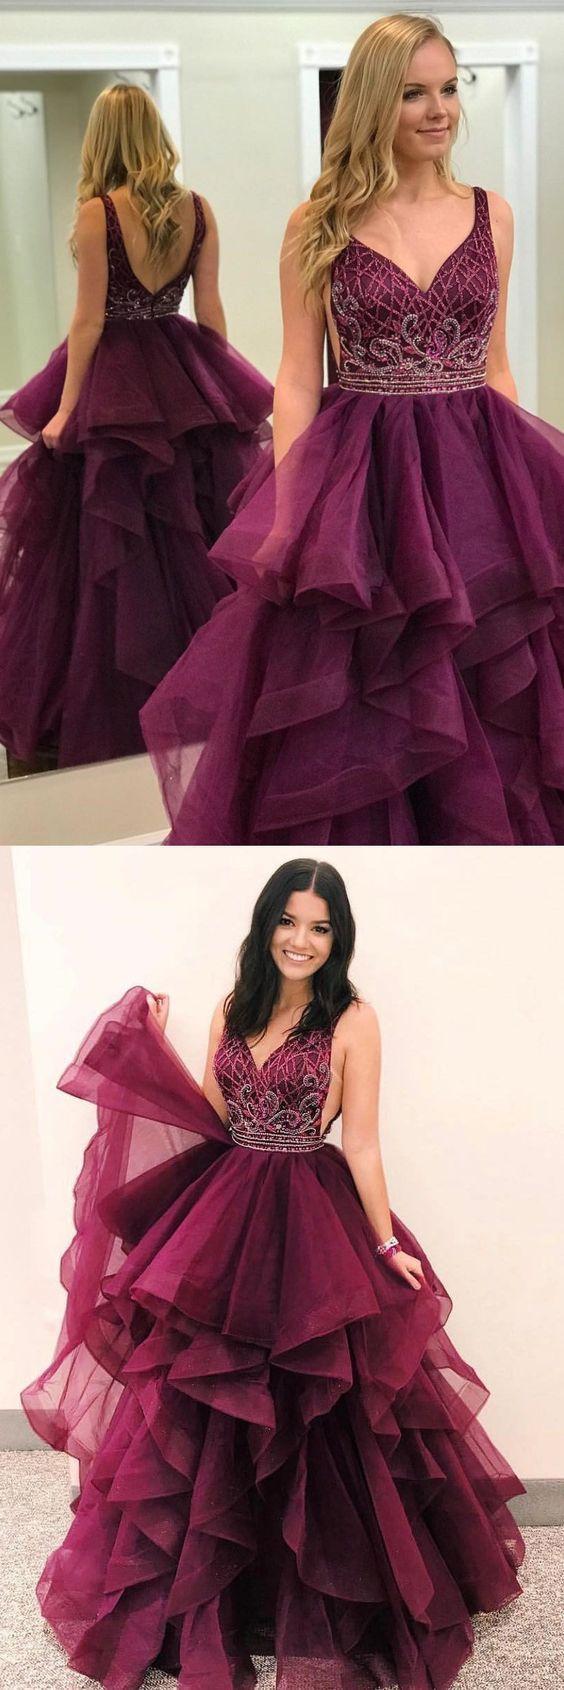 prom dress long prom dress gorgeous beads burgundy long prom